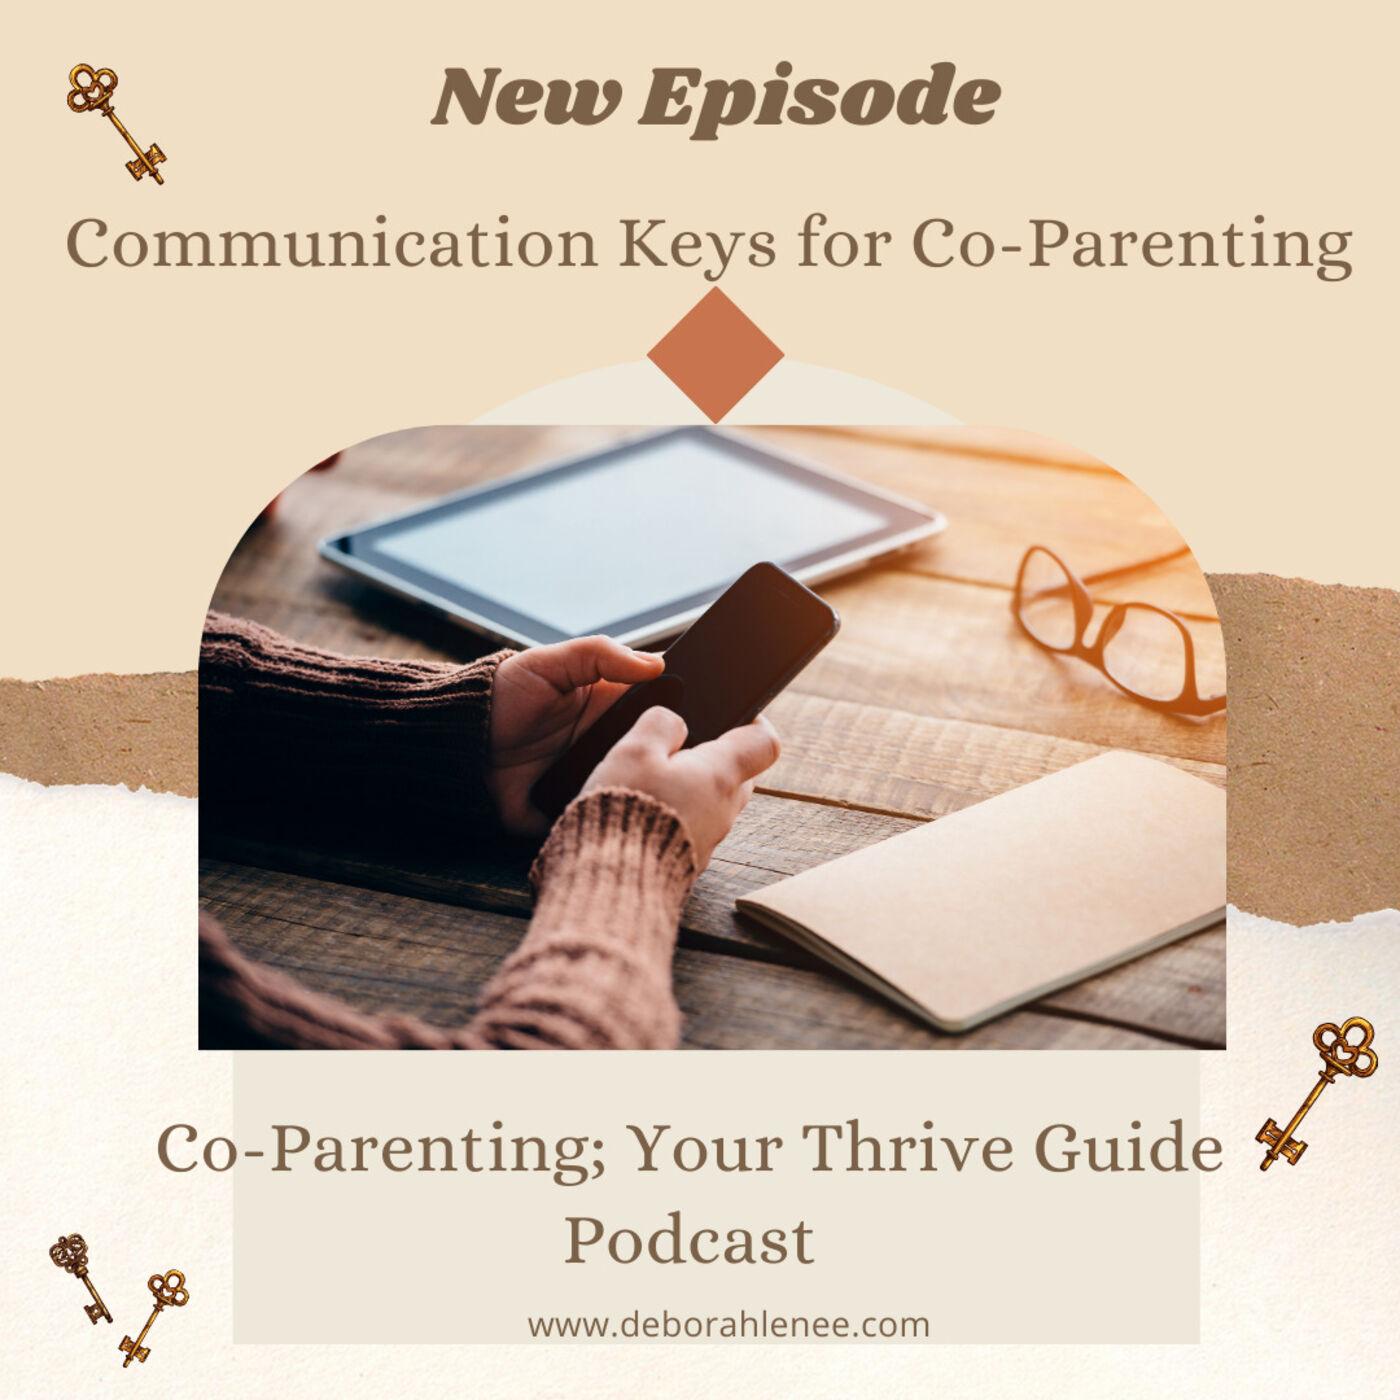 Communication Keys for Co-Parenting